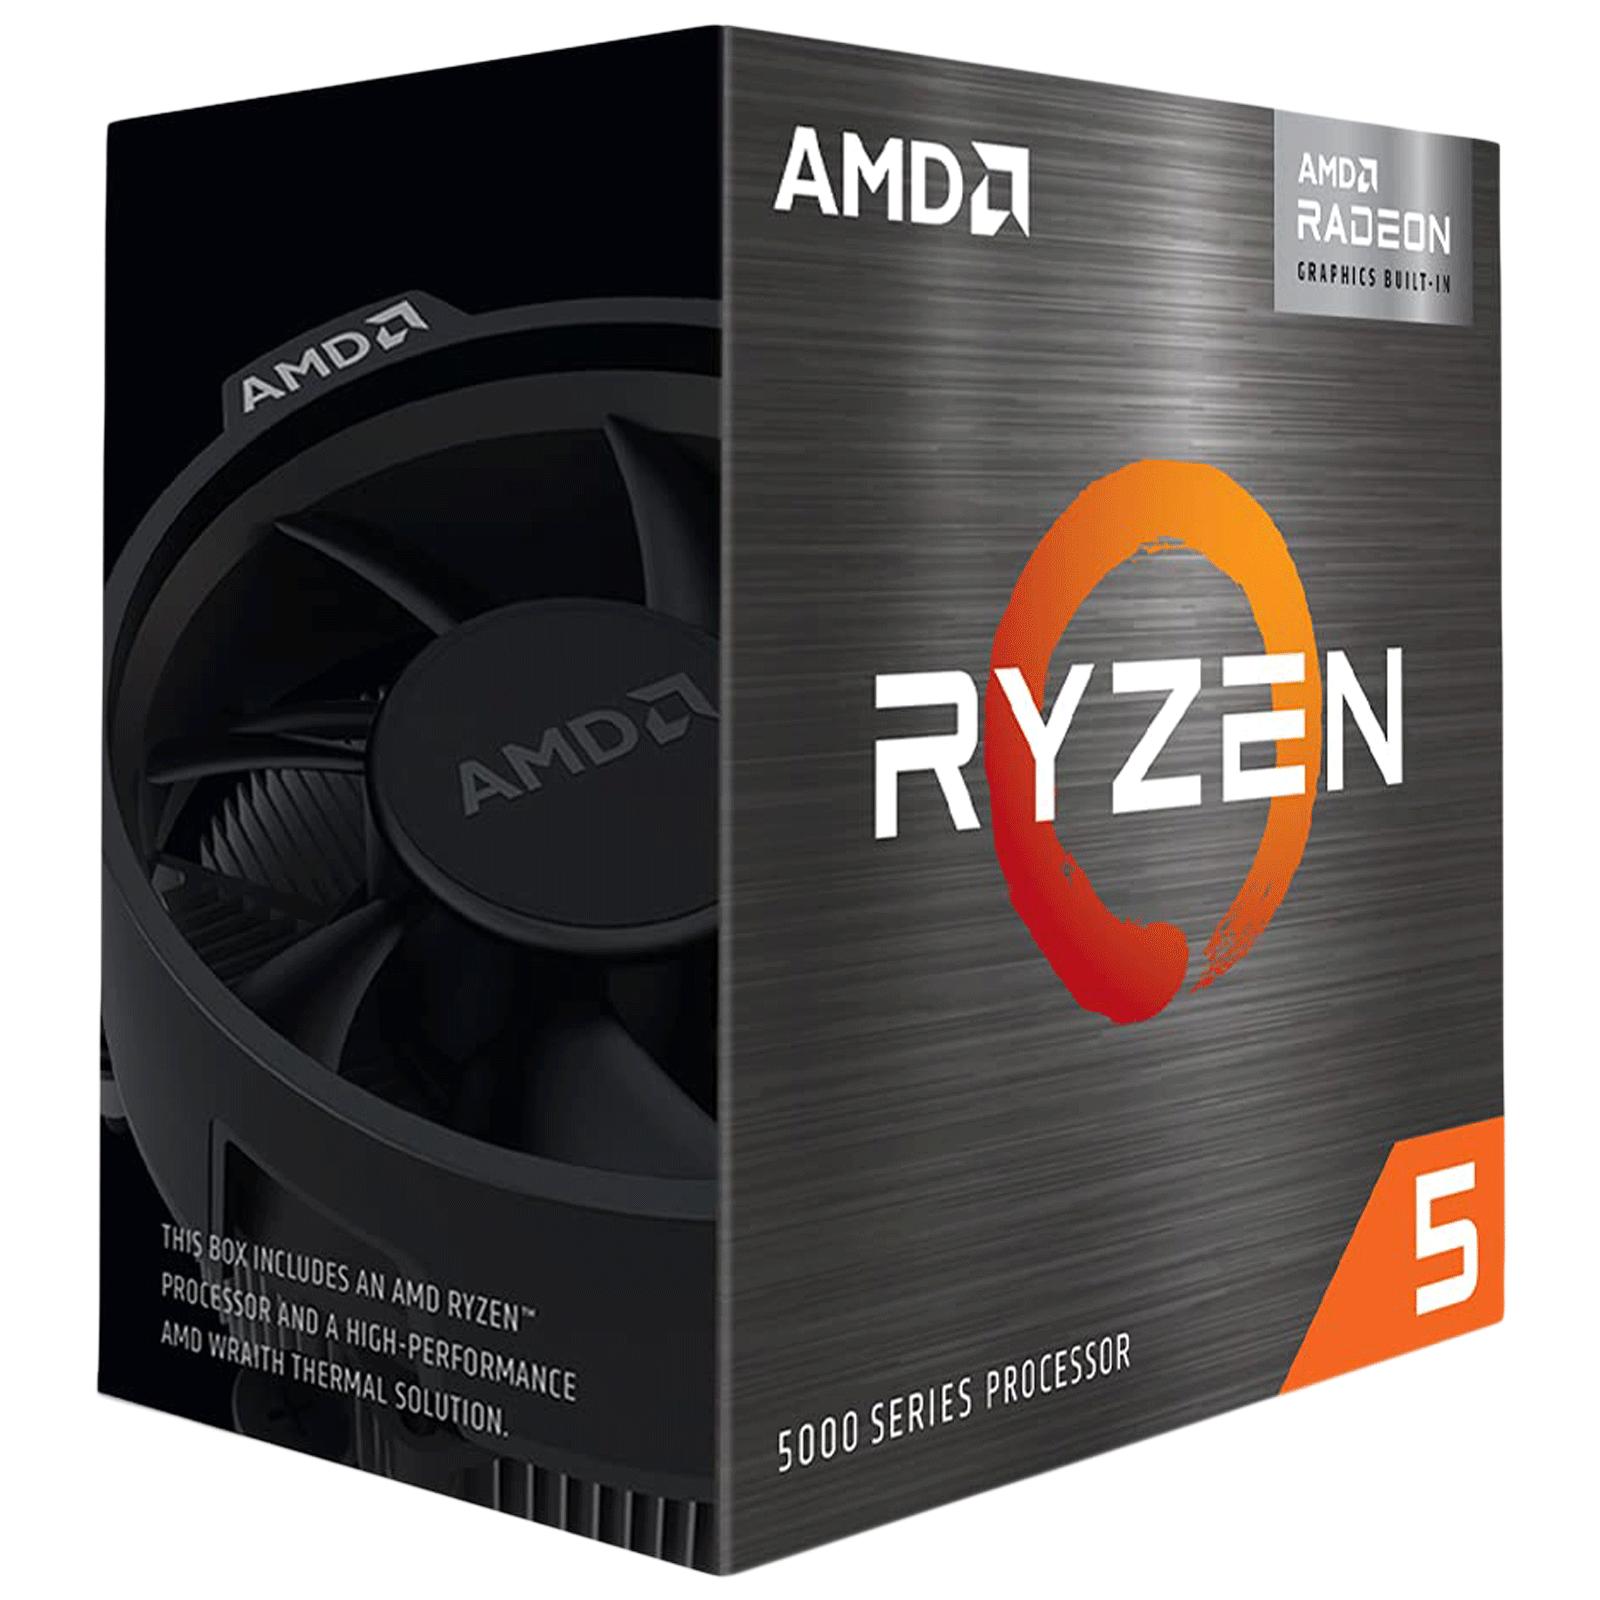 AMD Ryzen 5 Desktop Processor (6 Cores, 3.9 GHz, Wraith Stealth Cooling, 5600G, Silver)_1